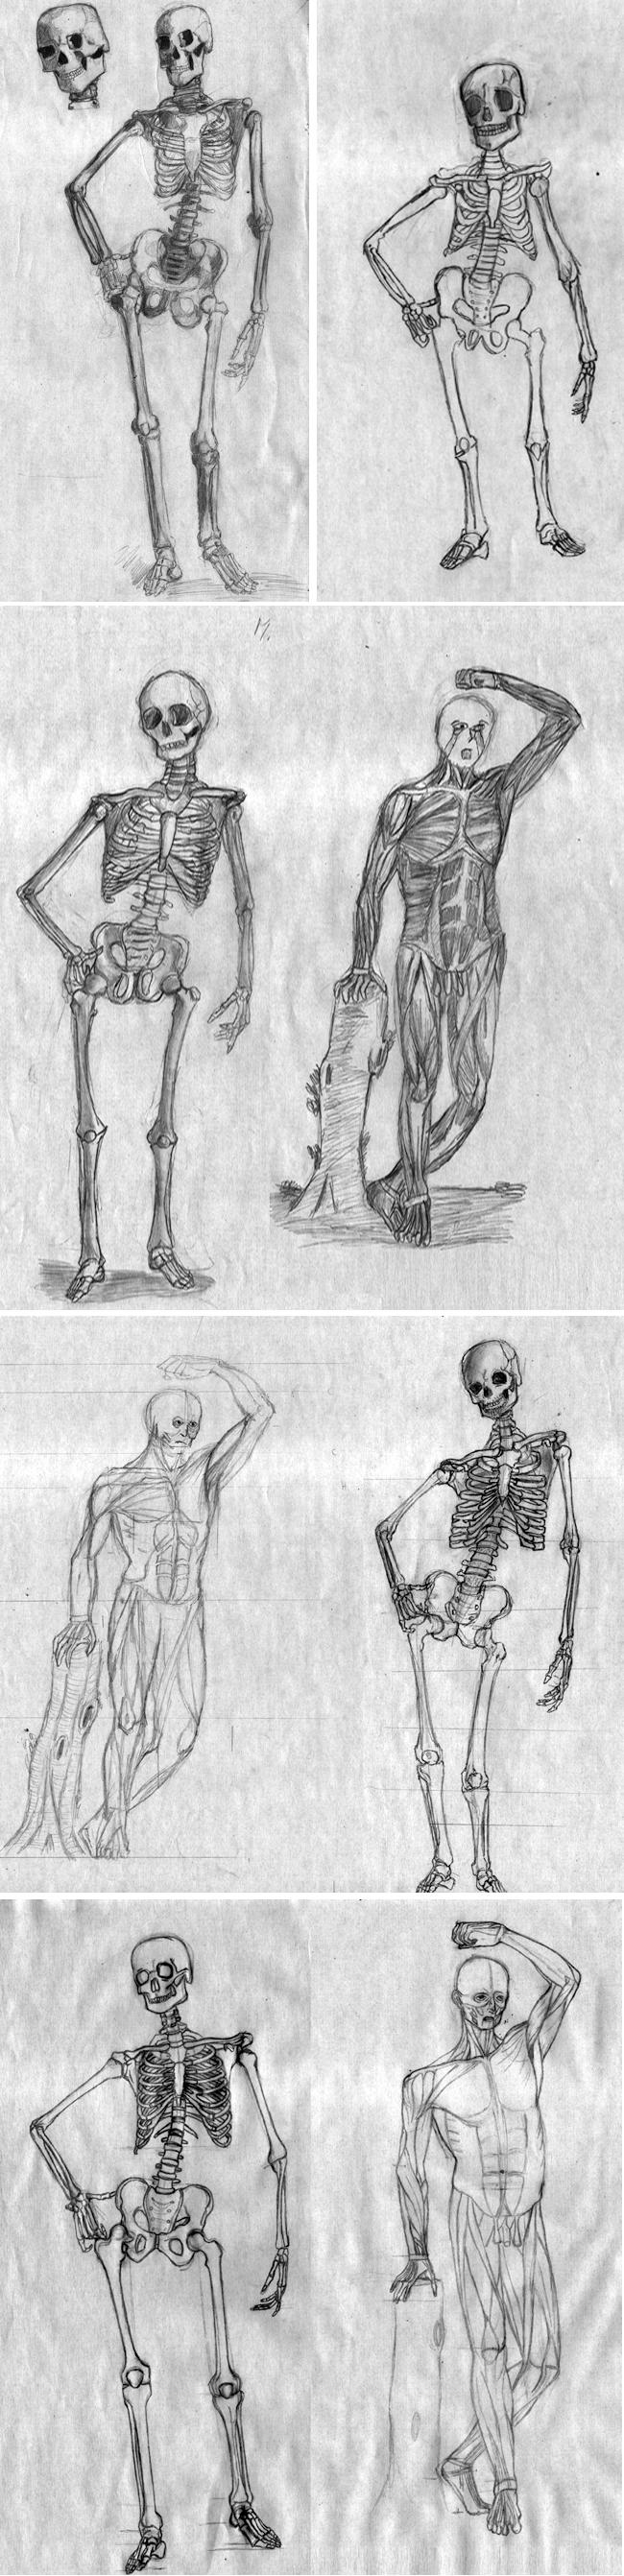 curso-comic-anatomia-animal-humana-dibujo3